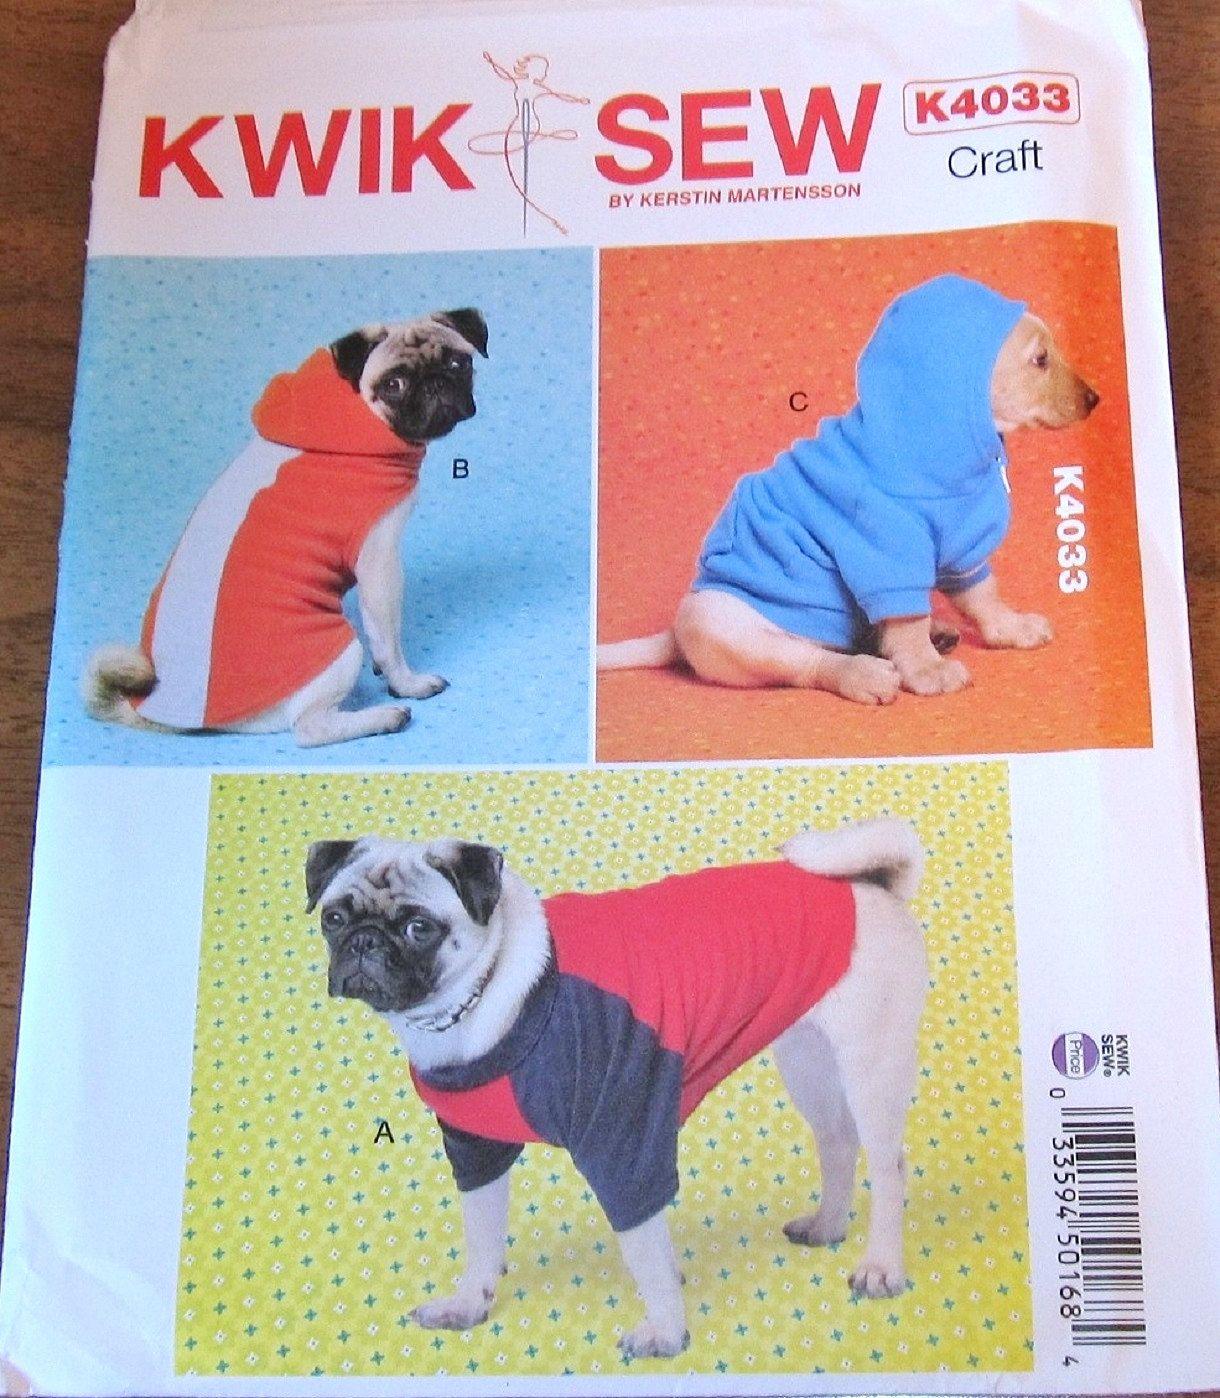 Kwik sew craft sewing pattern 4033 dog coats pet sweaters kwik sew craft sewing pattern 4033 dog coats pet sweaters hoodies clothes jeuxipadfo Image collections